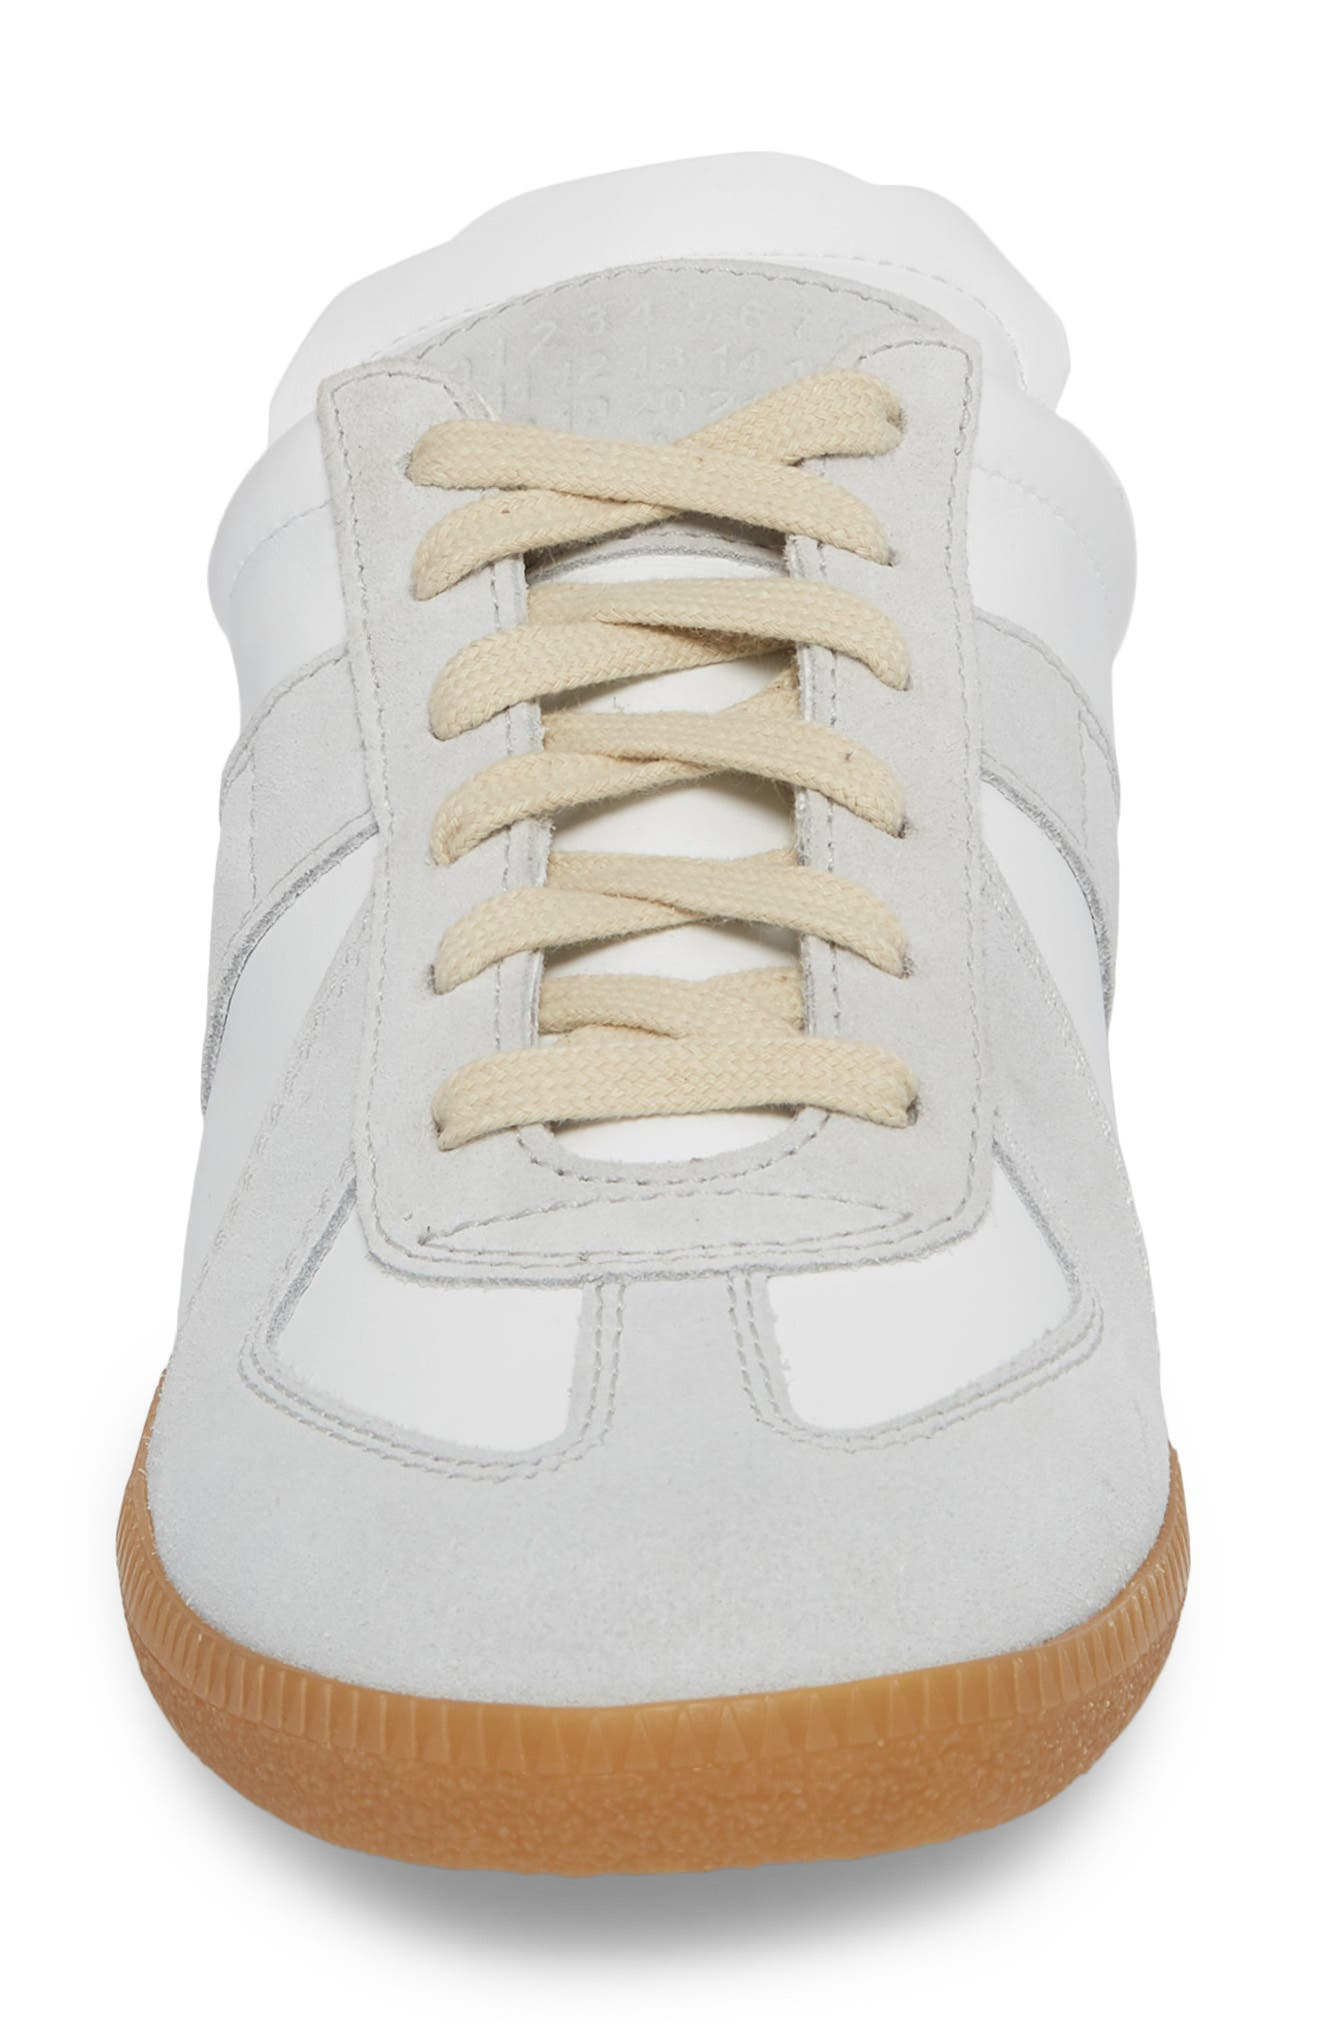 Replica Sneaker Mule,                             Alternate thumbnail 4, color,                             Amber/ White